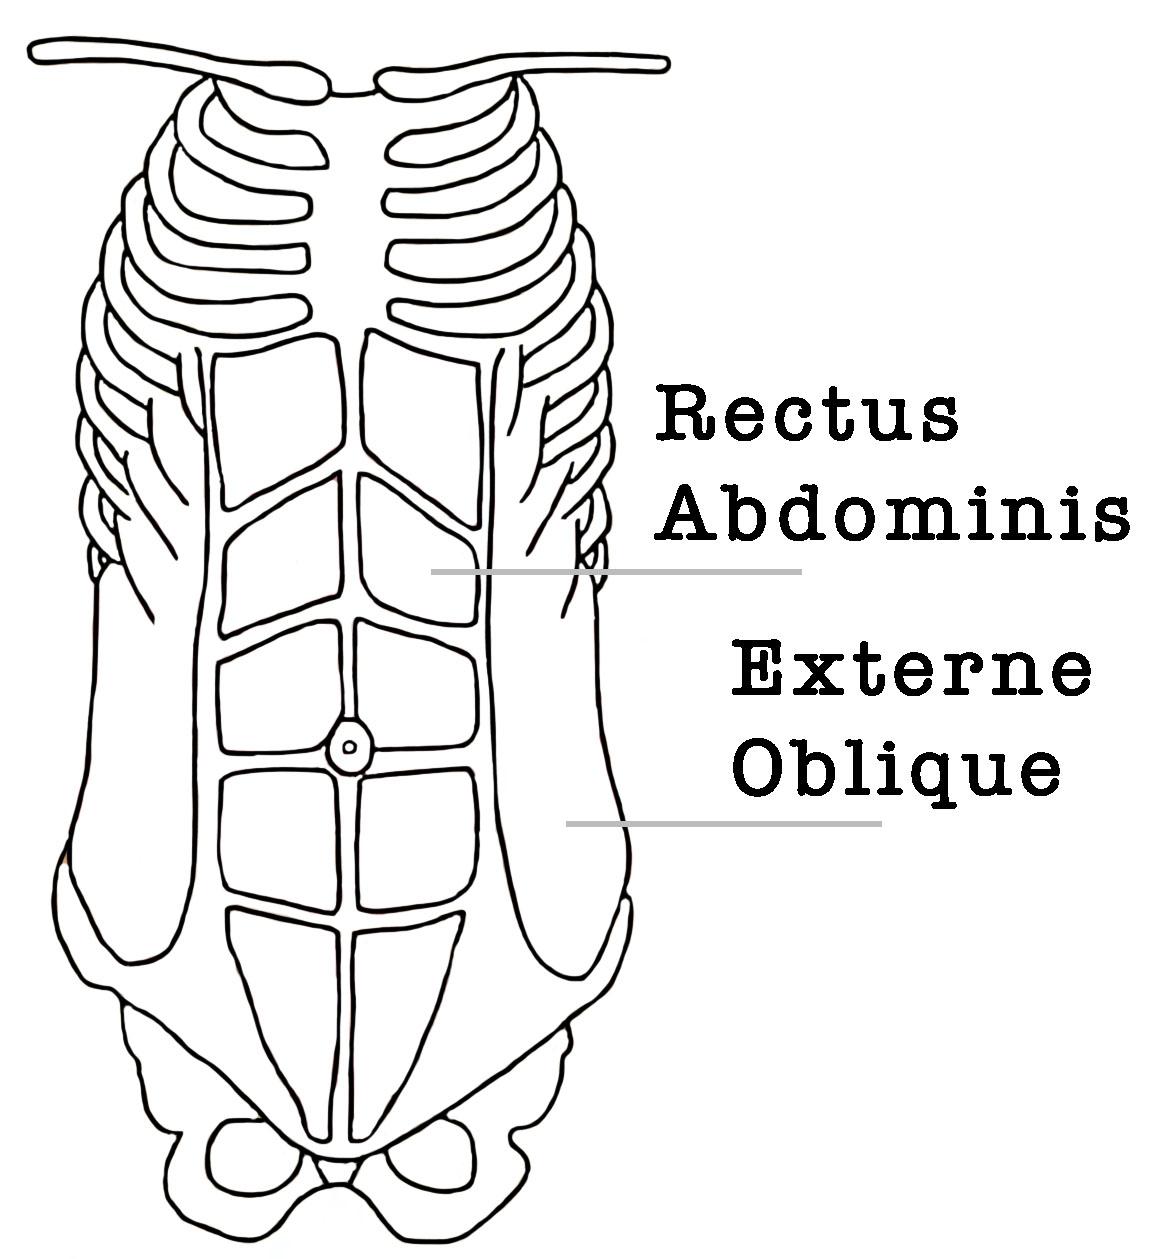 rectus abdominis yoga anatomie